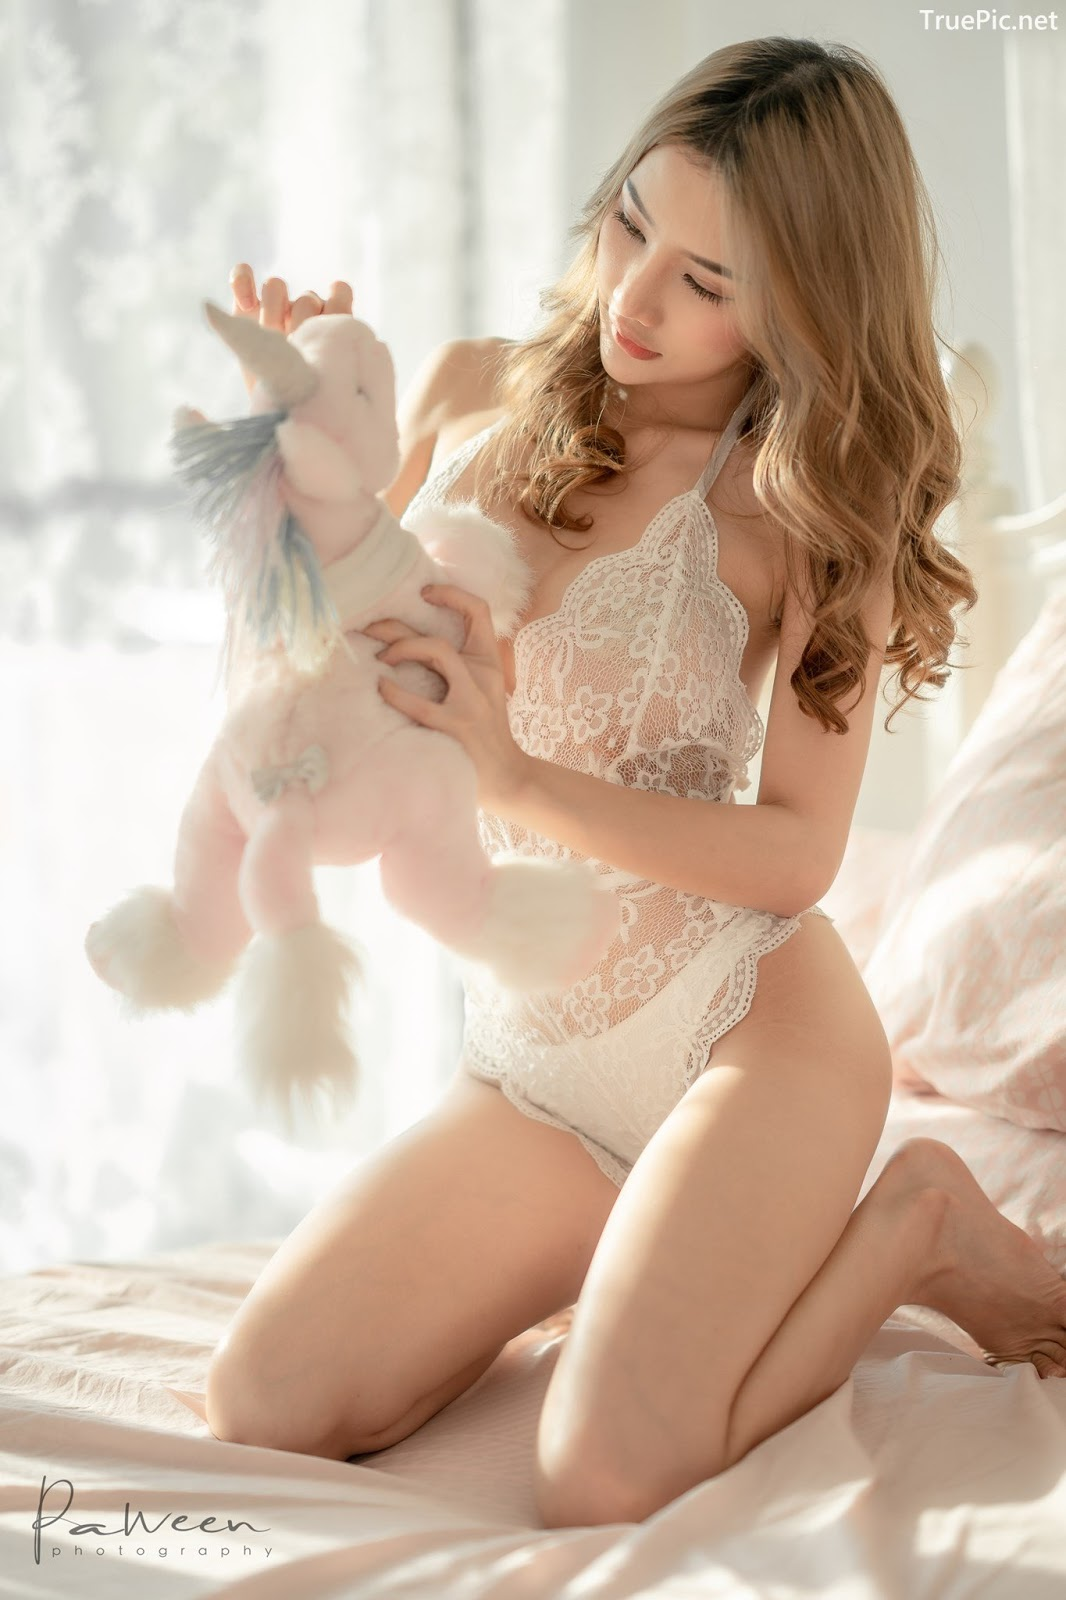 Image Thailand Model - Atittaya Chaiyasing - White Lace Lingerie - TruePic.net - Picture-22